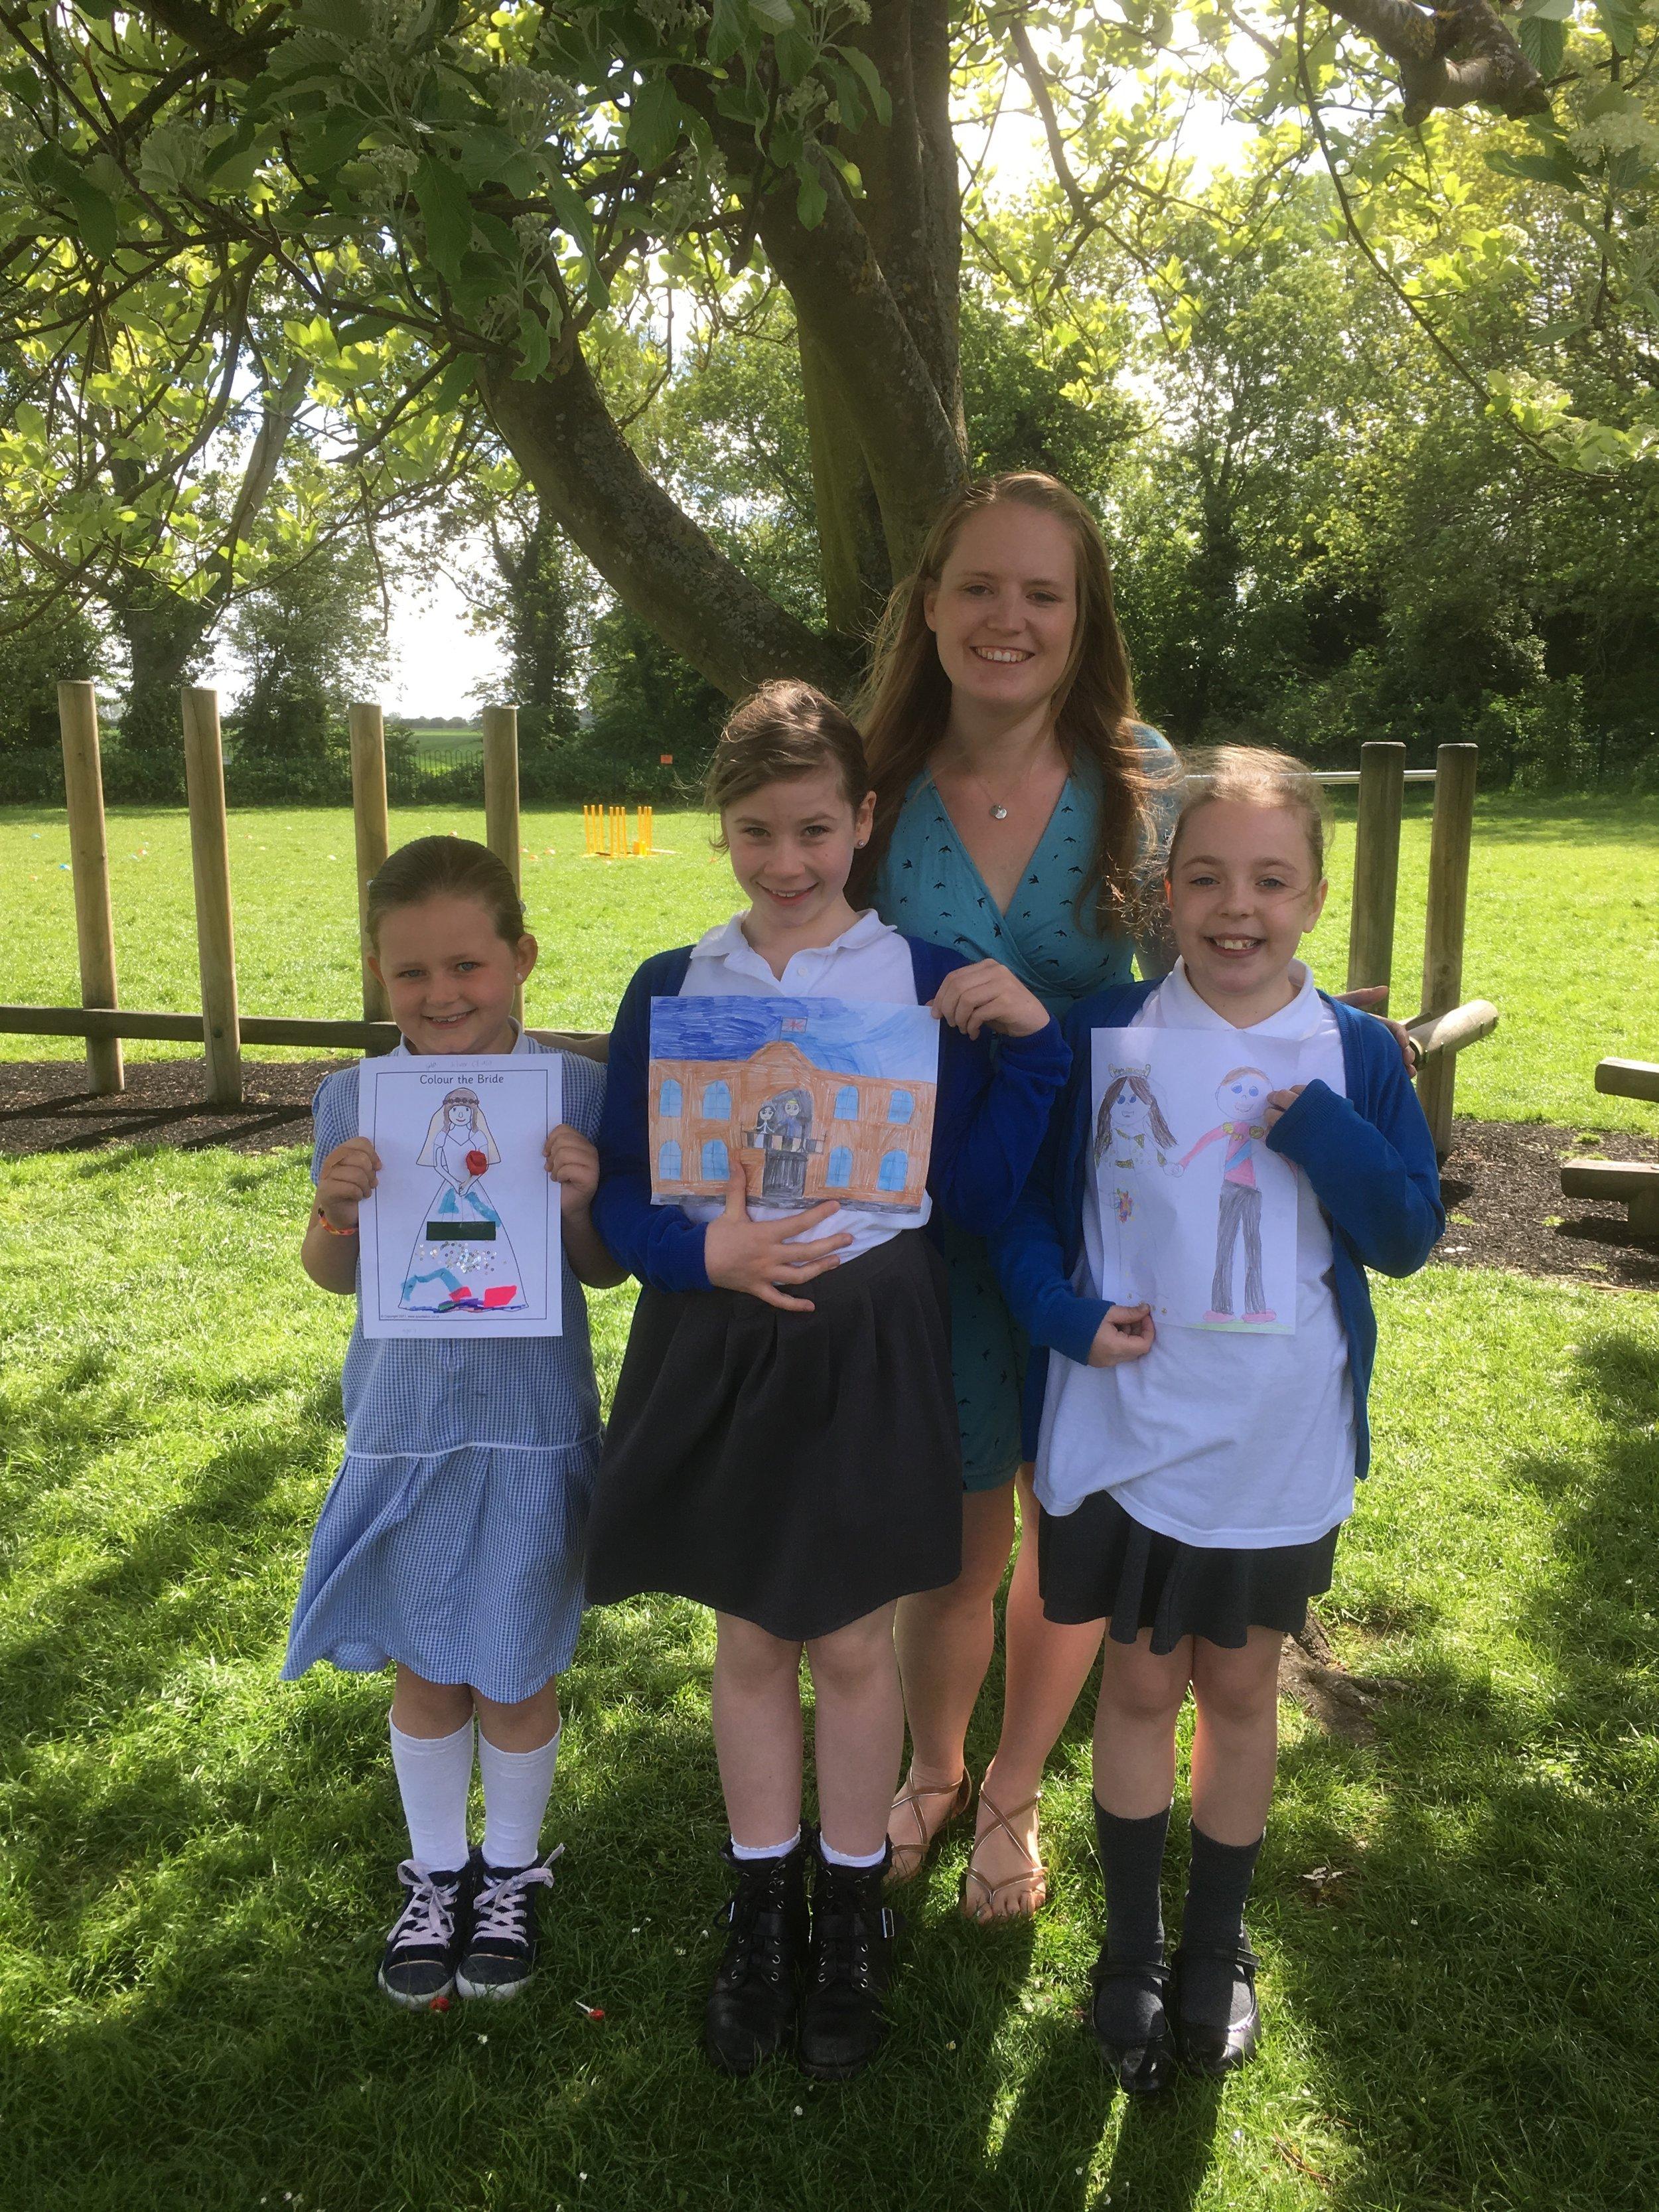 bedfordshire royal wedding winners